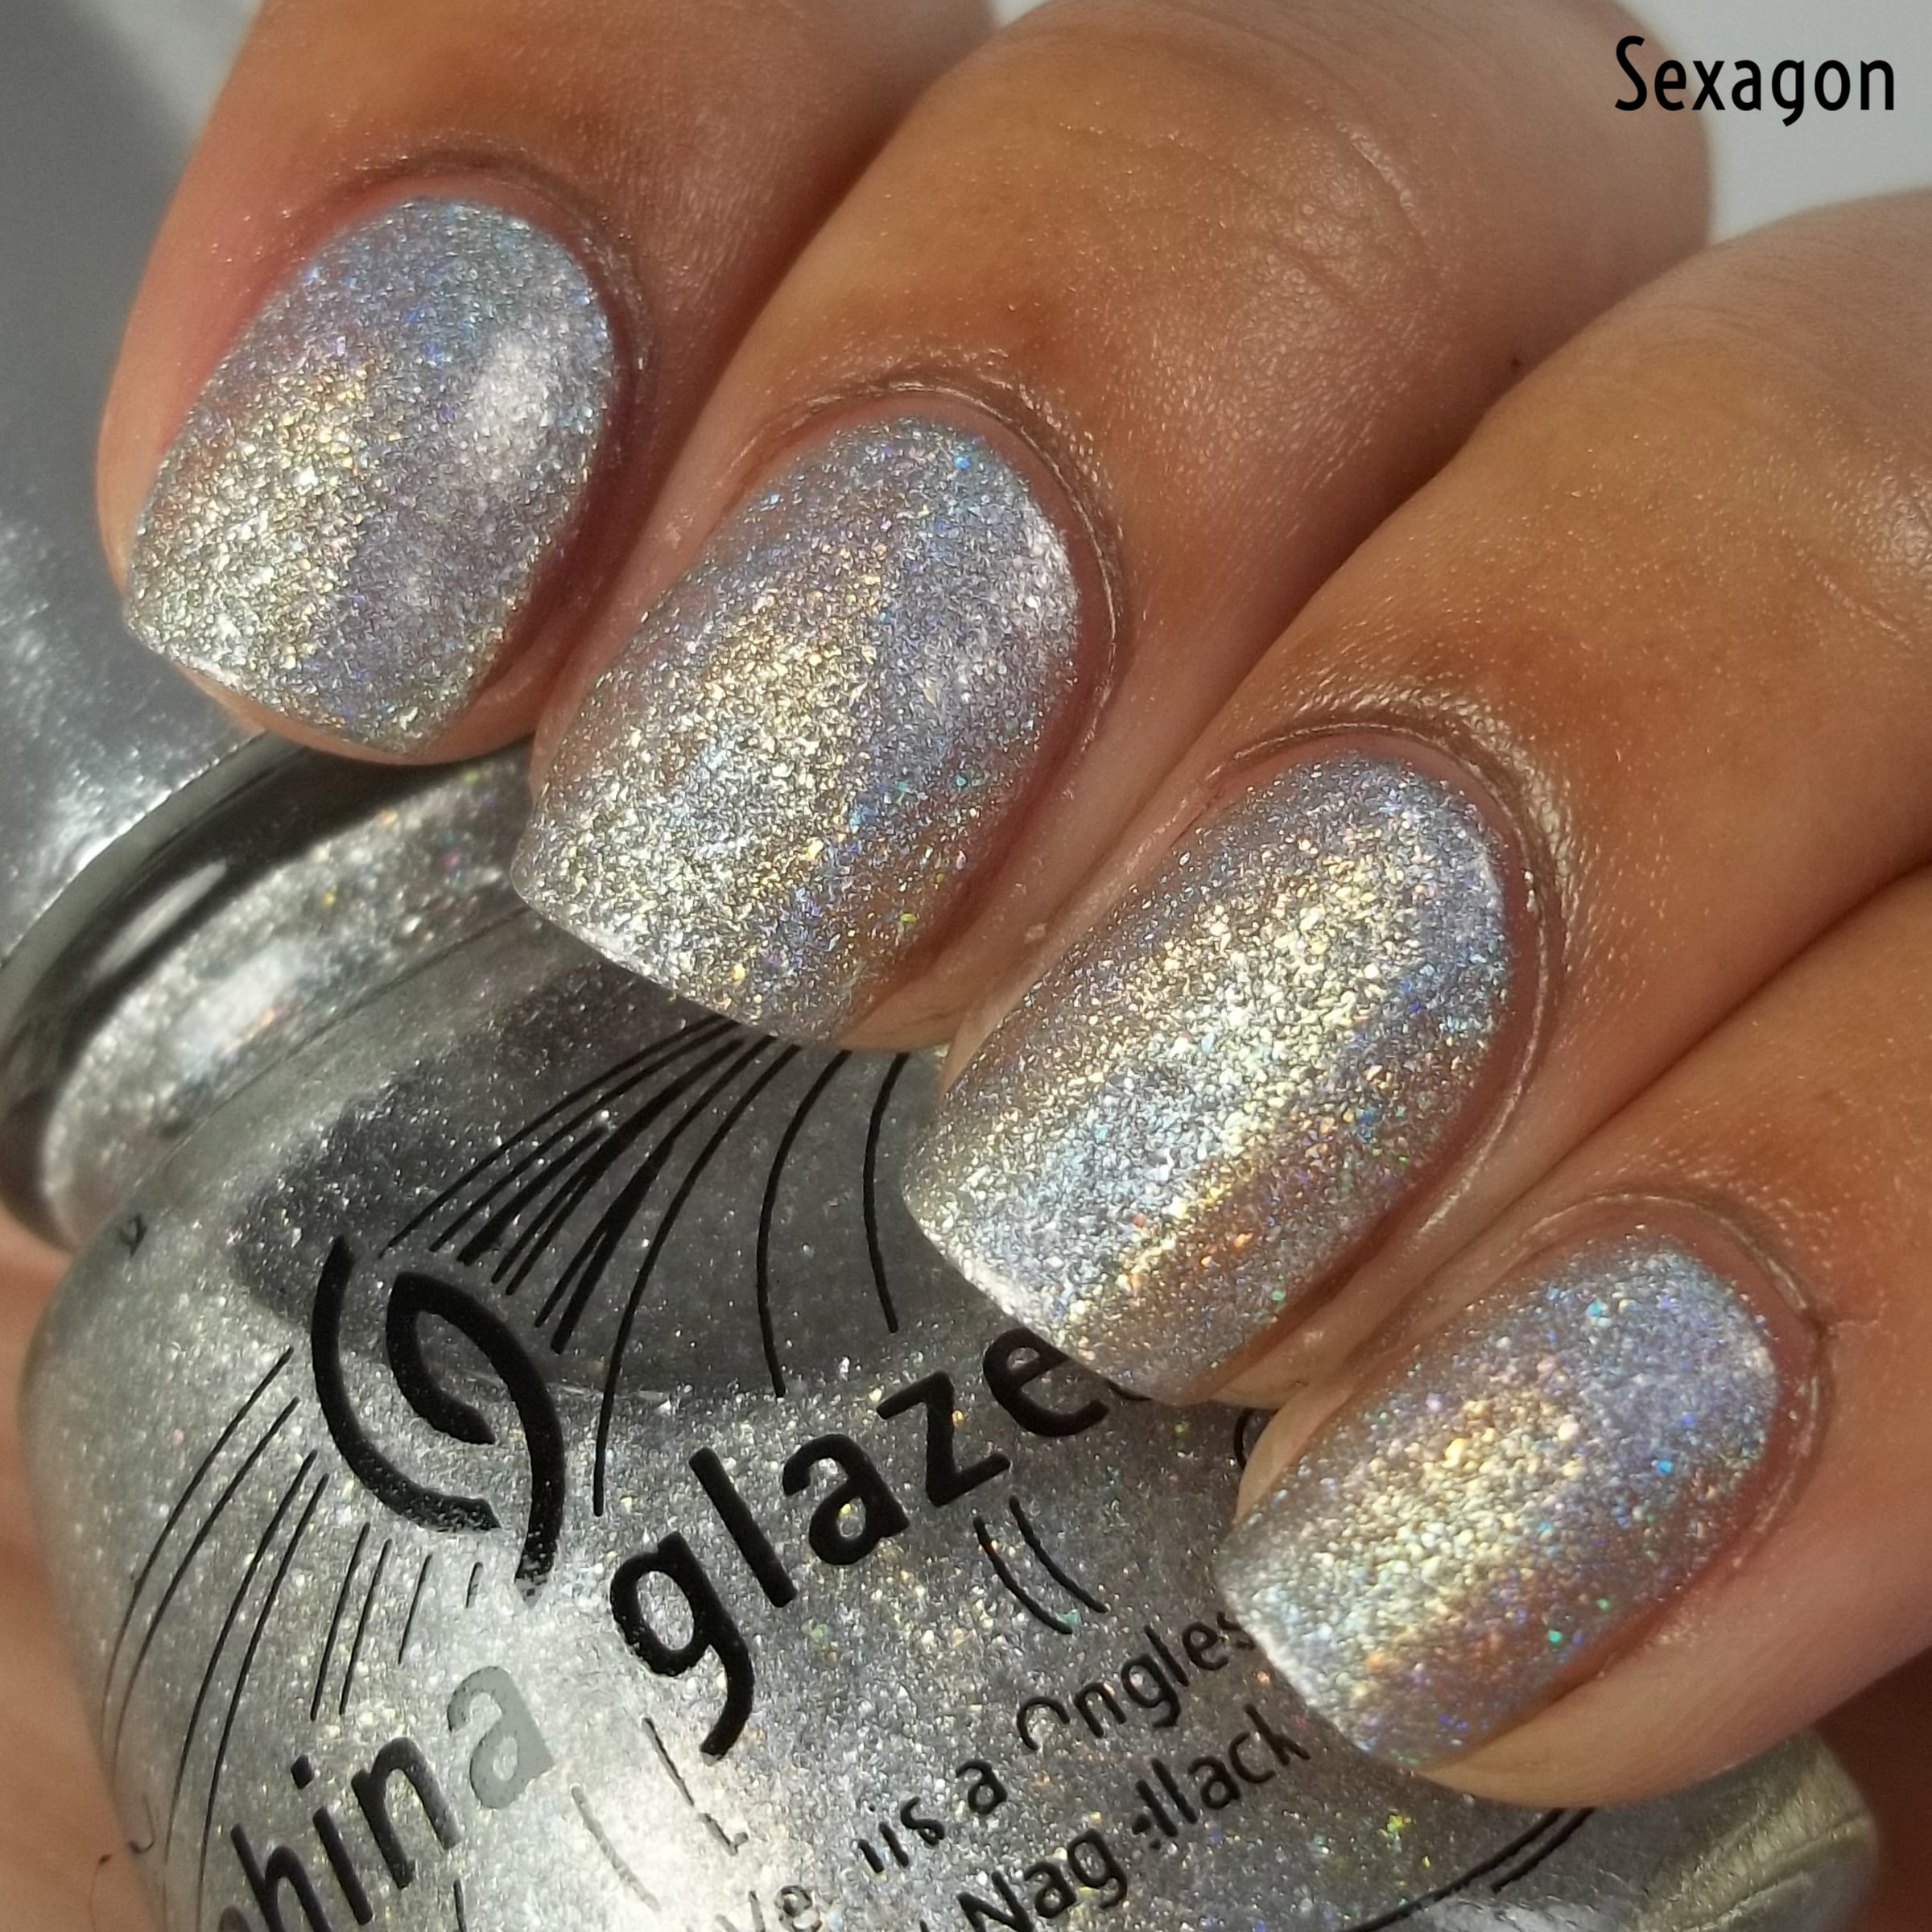 China Glaze Kaleidoscope - Sexagon.jpg